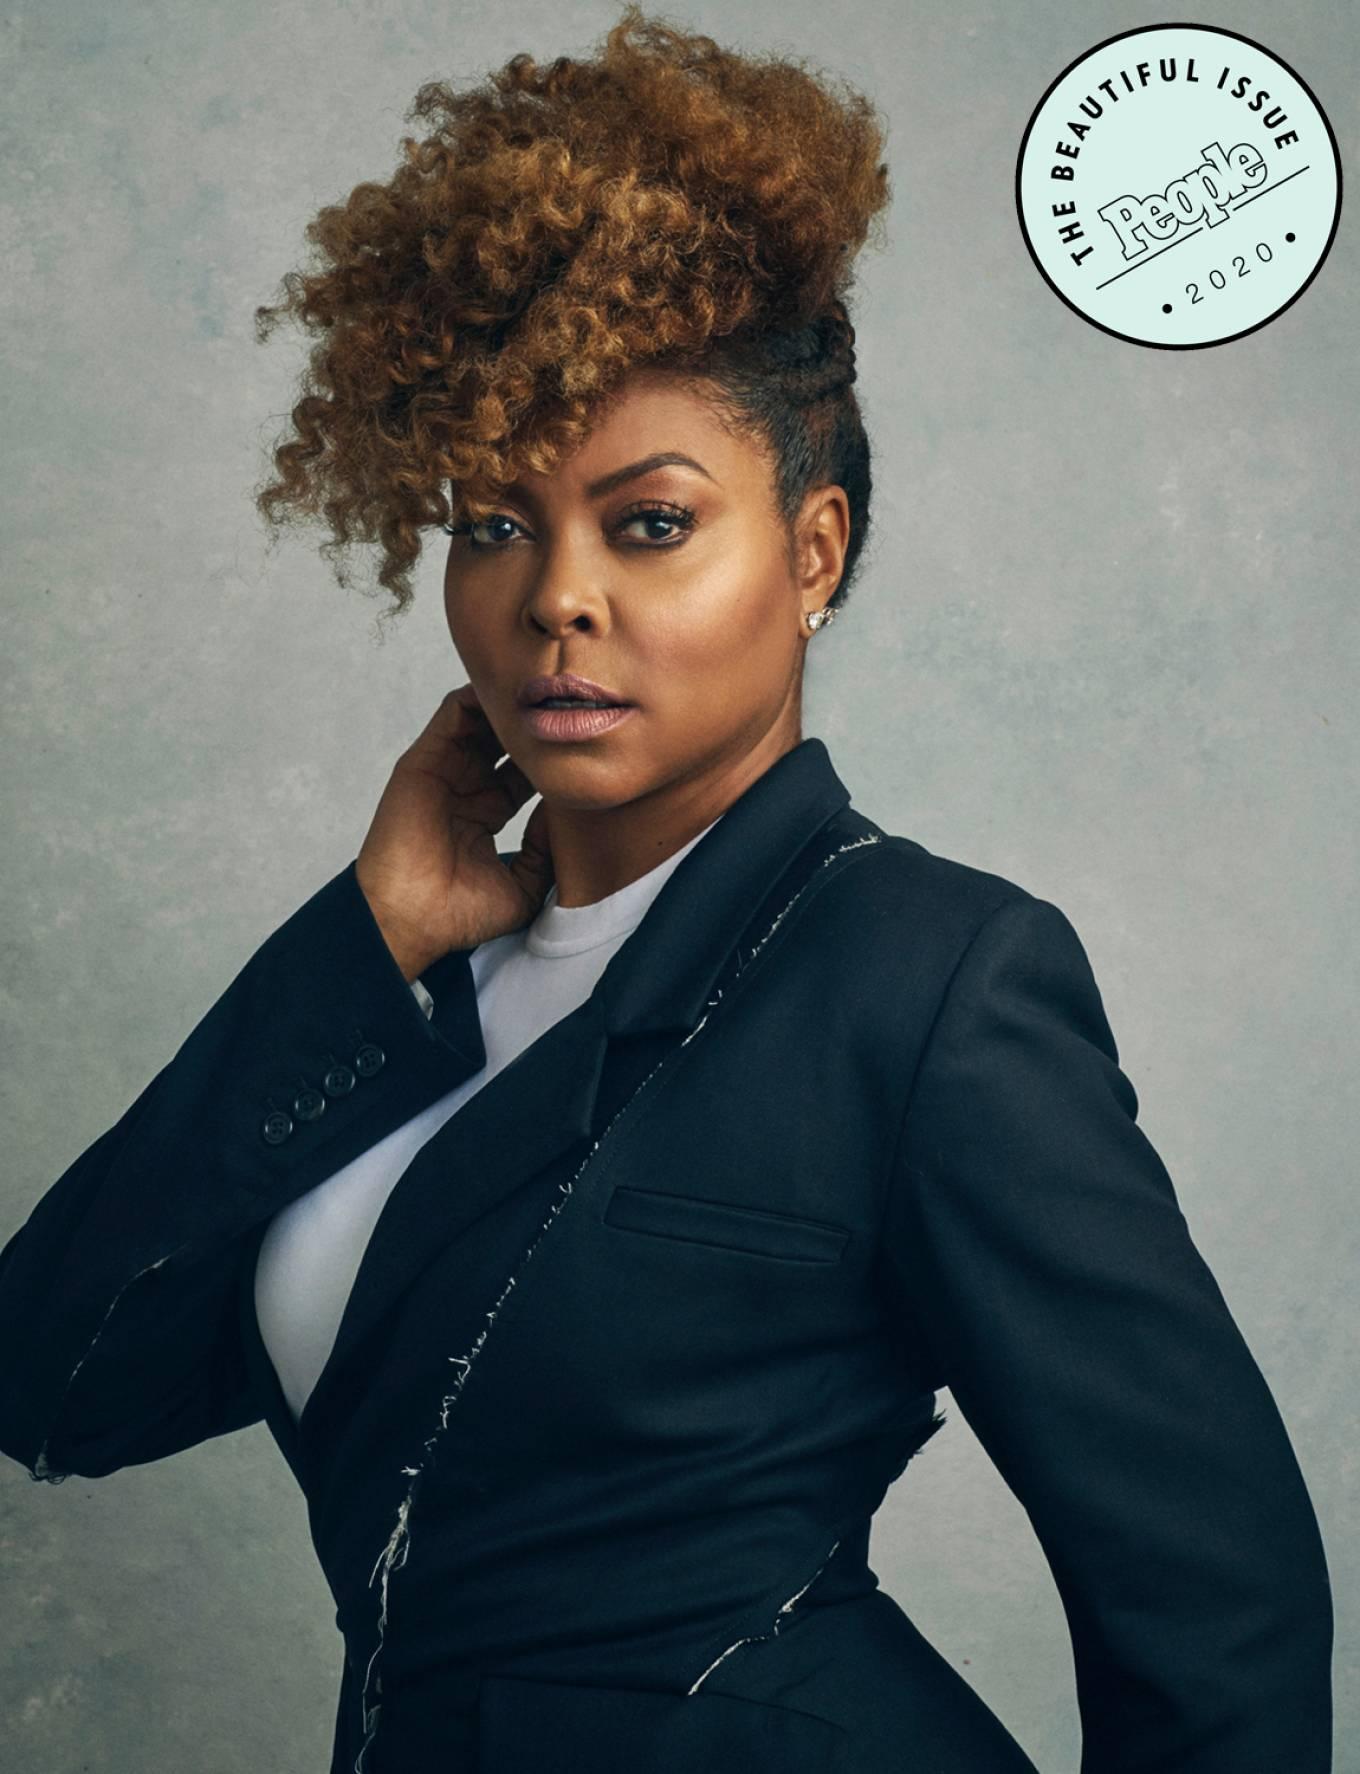 Taraji P. Henson - PEOPLE Magazine – 'Most Beautiful' (May 2020)